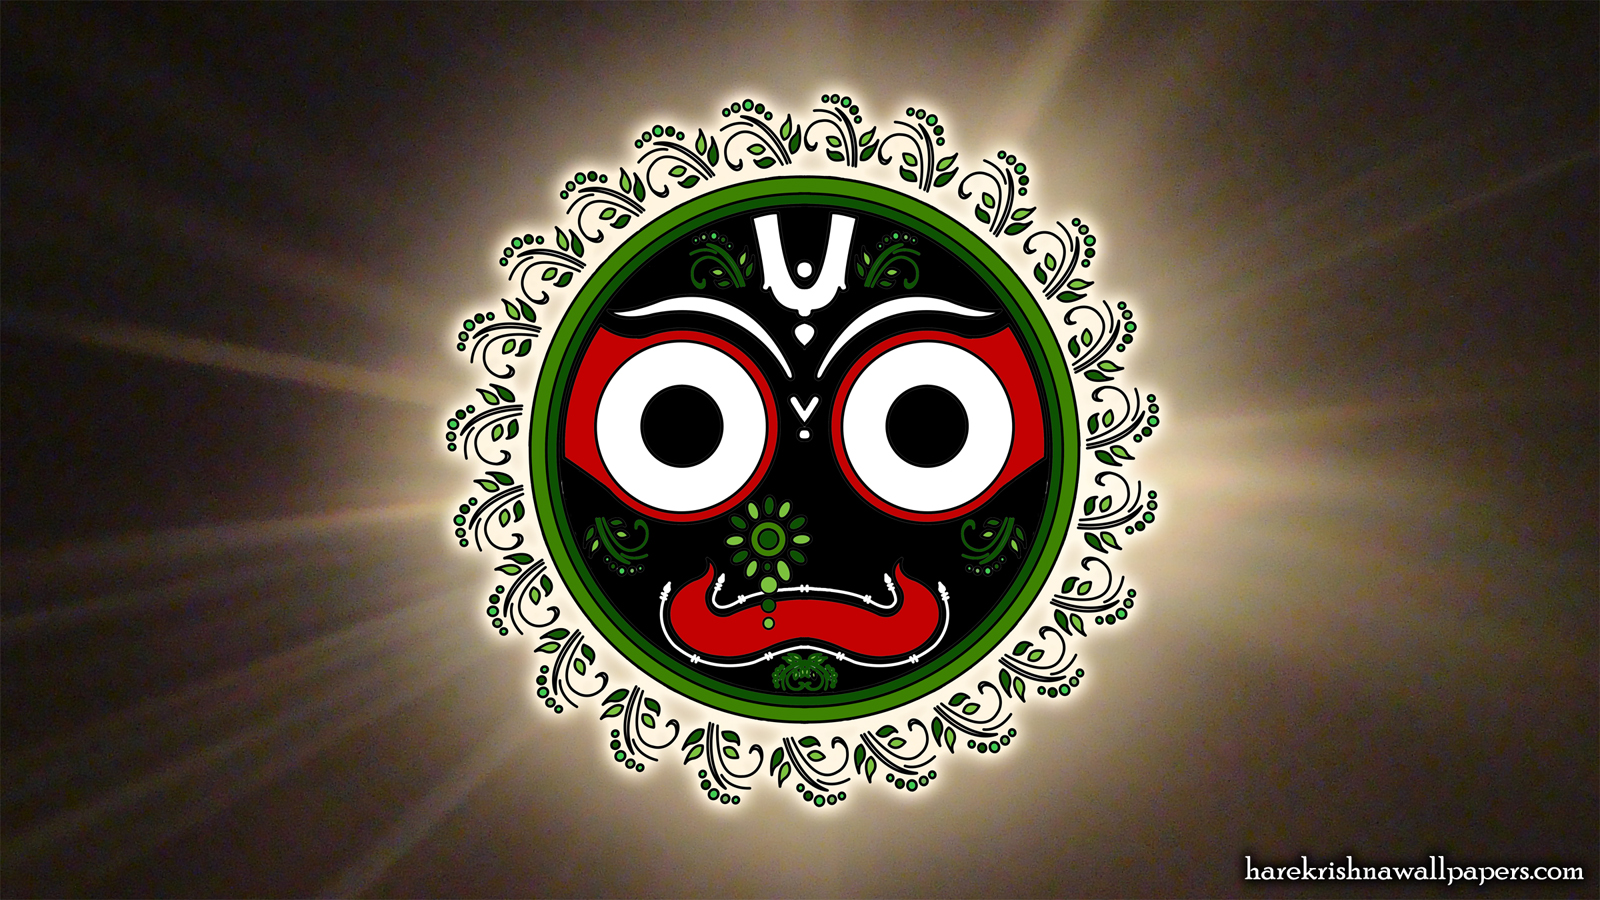 Jai Jagannath Wallpaper (030) Size 1600x900 Download